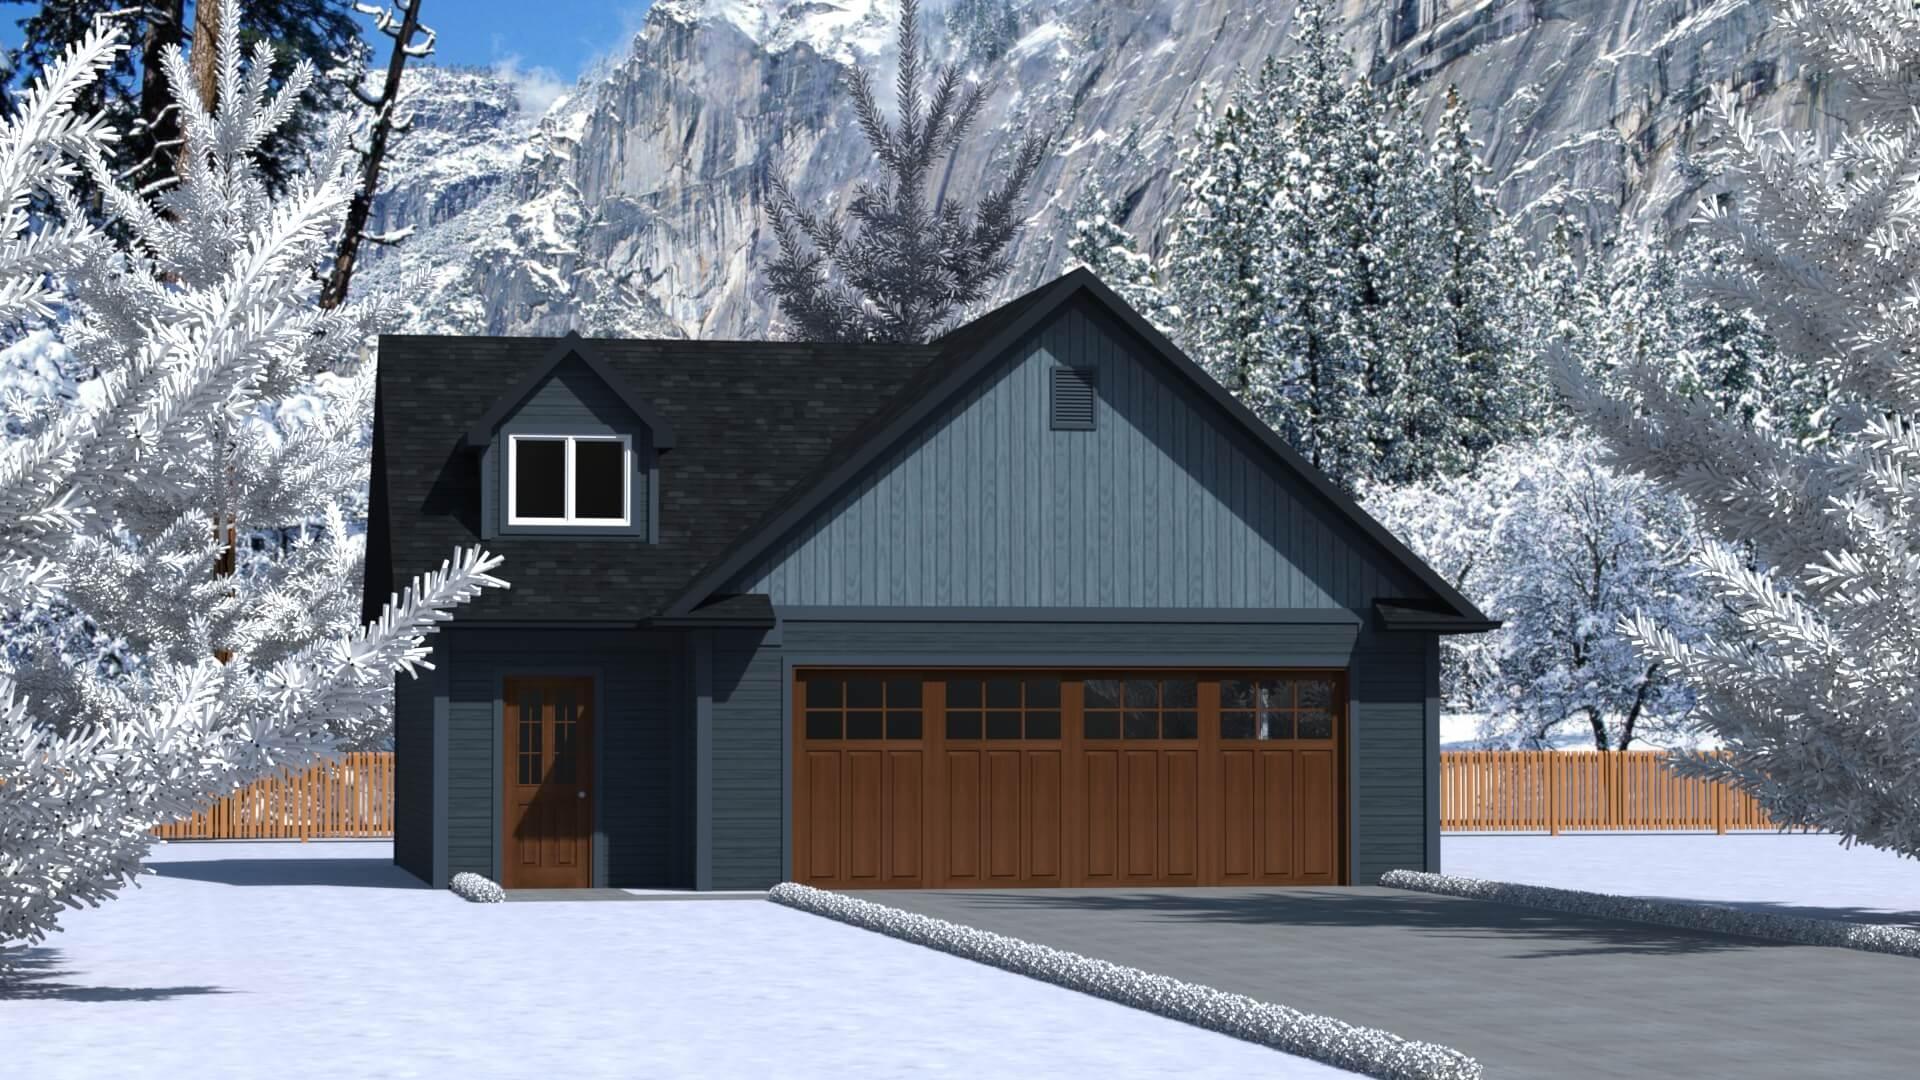 808 sq.ft. timber mart 2 car garage exterior render